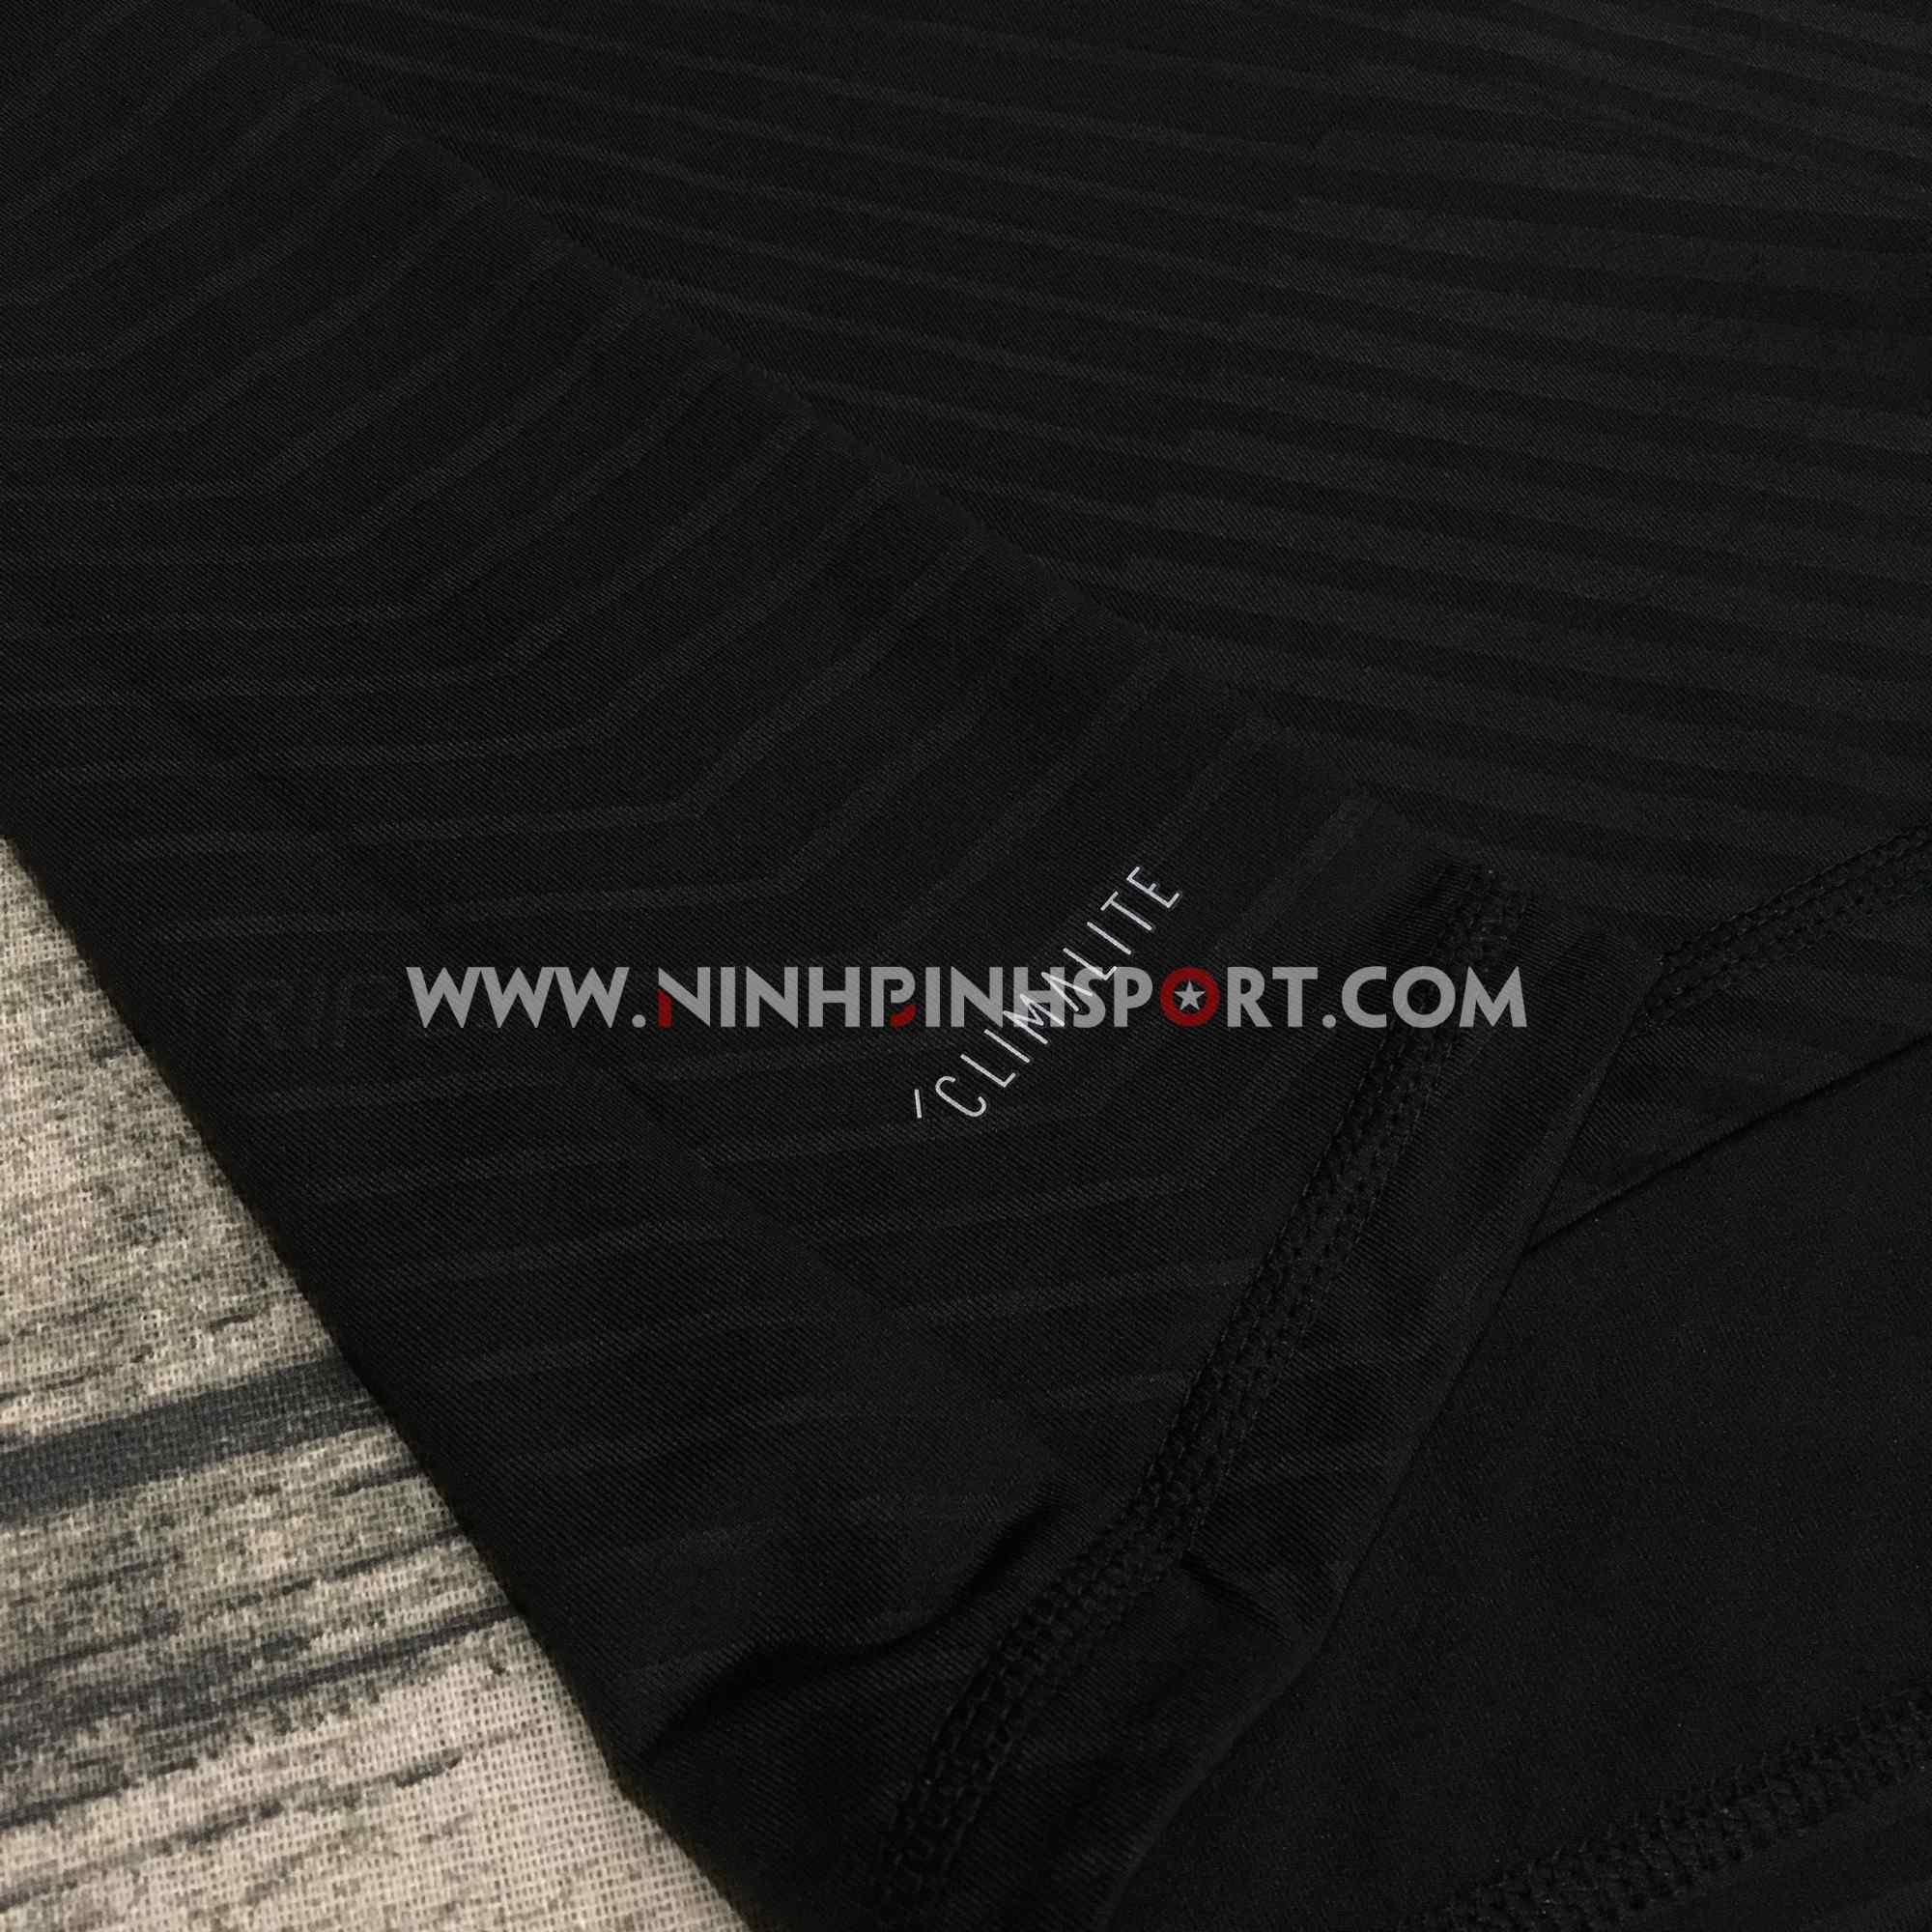 Áo thể thao nam Adidas FreeLift 360 Graphic Tee Black DS9278